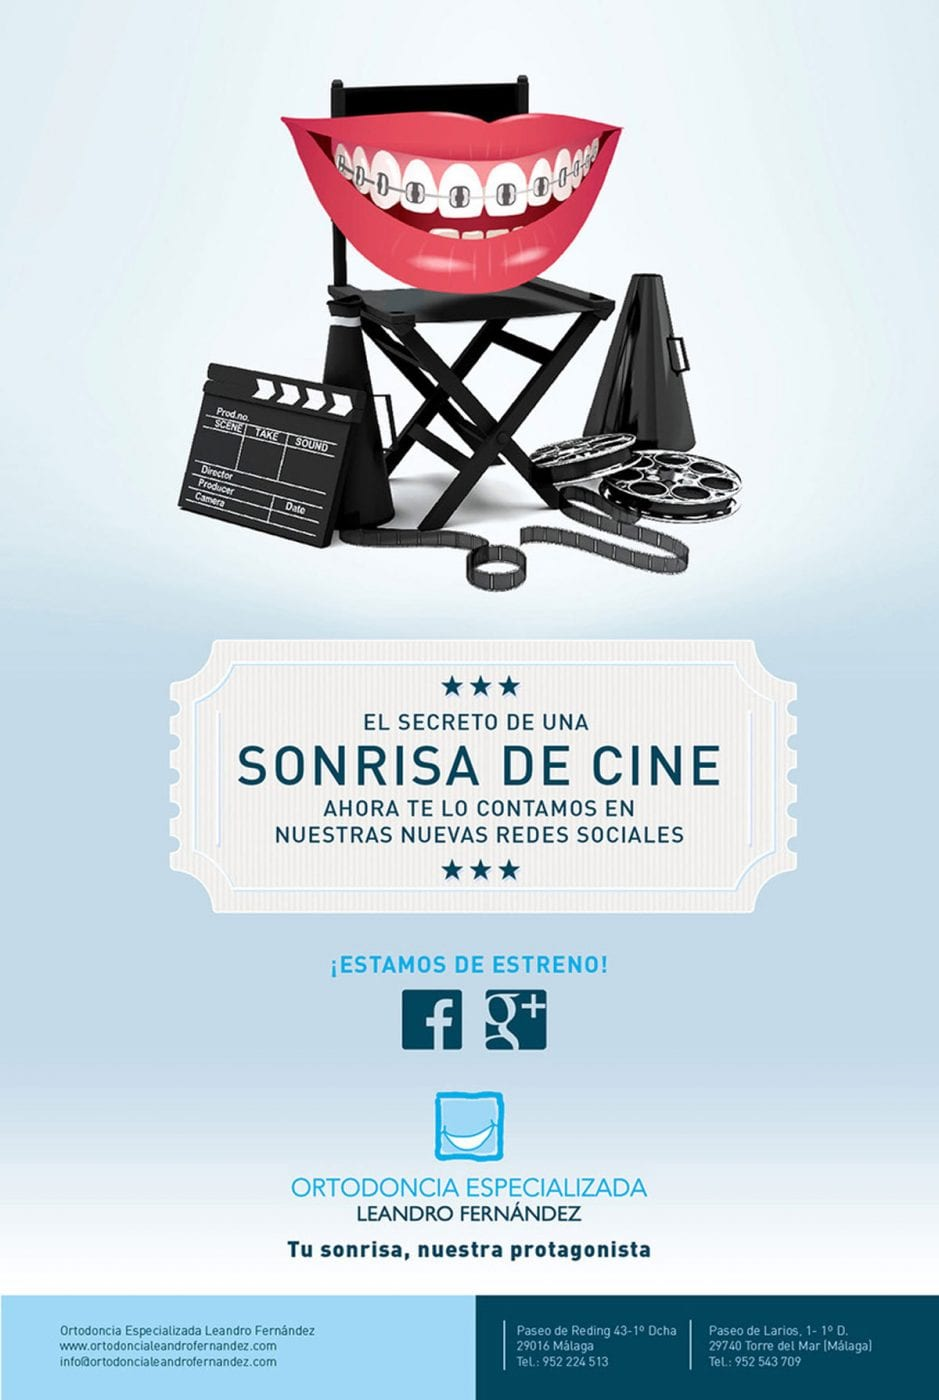 Ortodoncia especializada, Leandro Fernández, campaña creativa